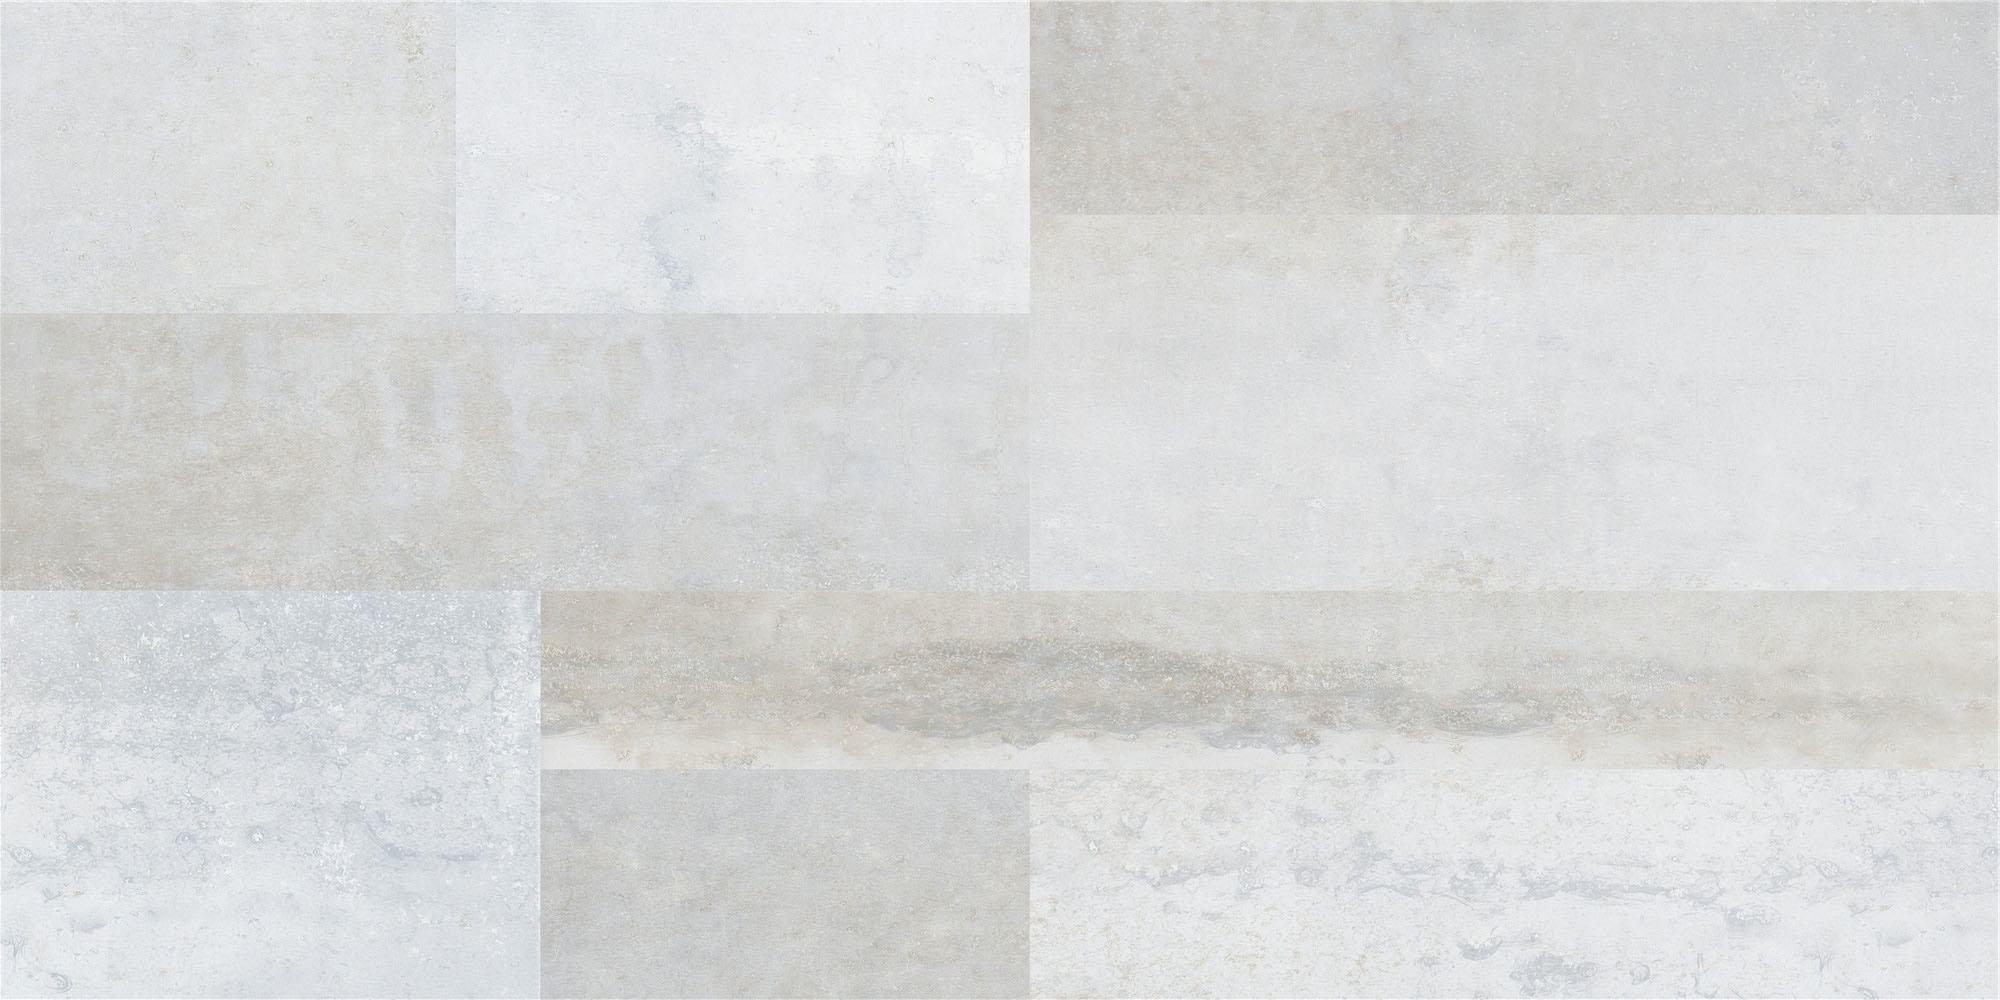 LONGFAVOR white wave 300x600mm Ceramic Wall Tile oem Walls-2